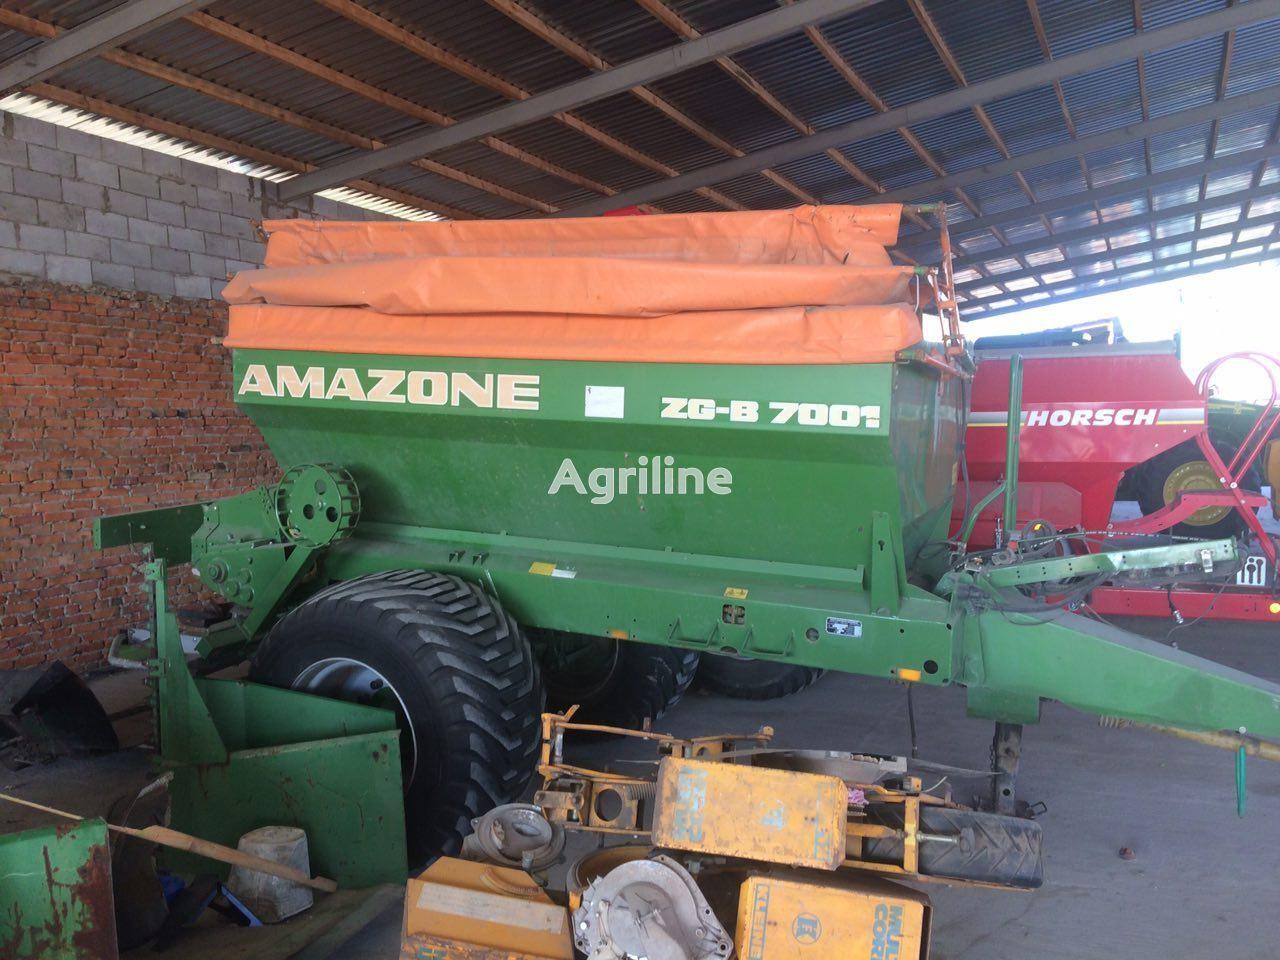 AMAZONE ZG-B 7001 abonadora arrastrada